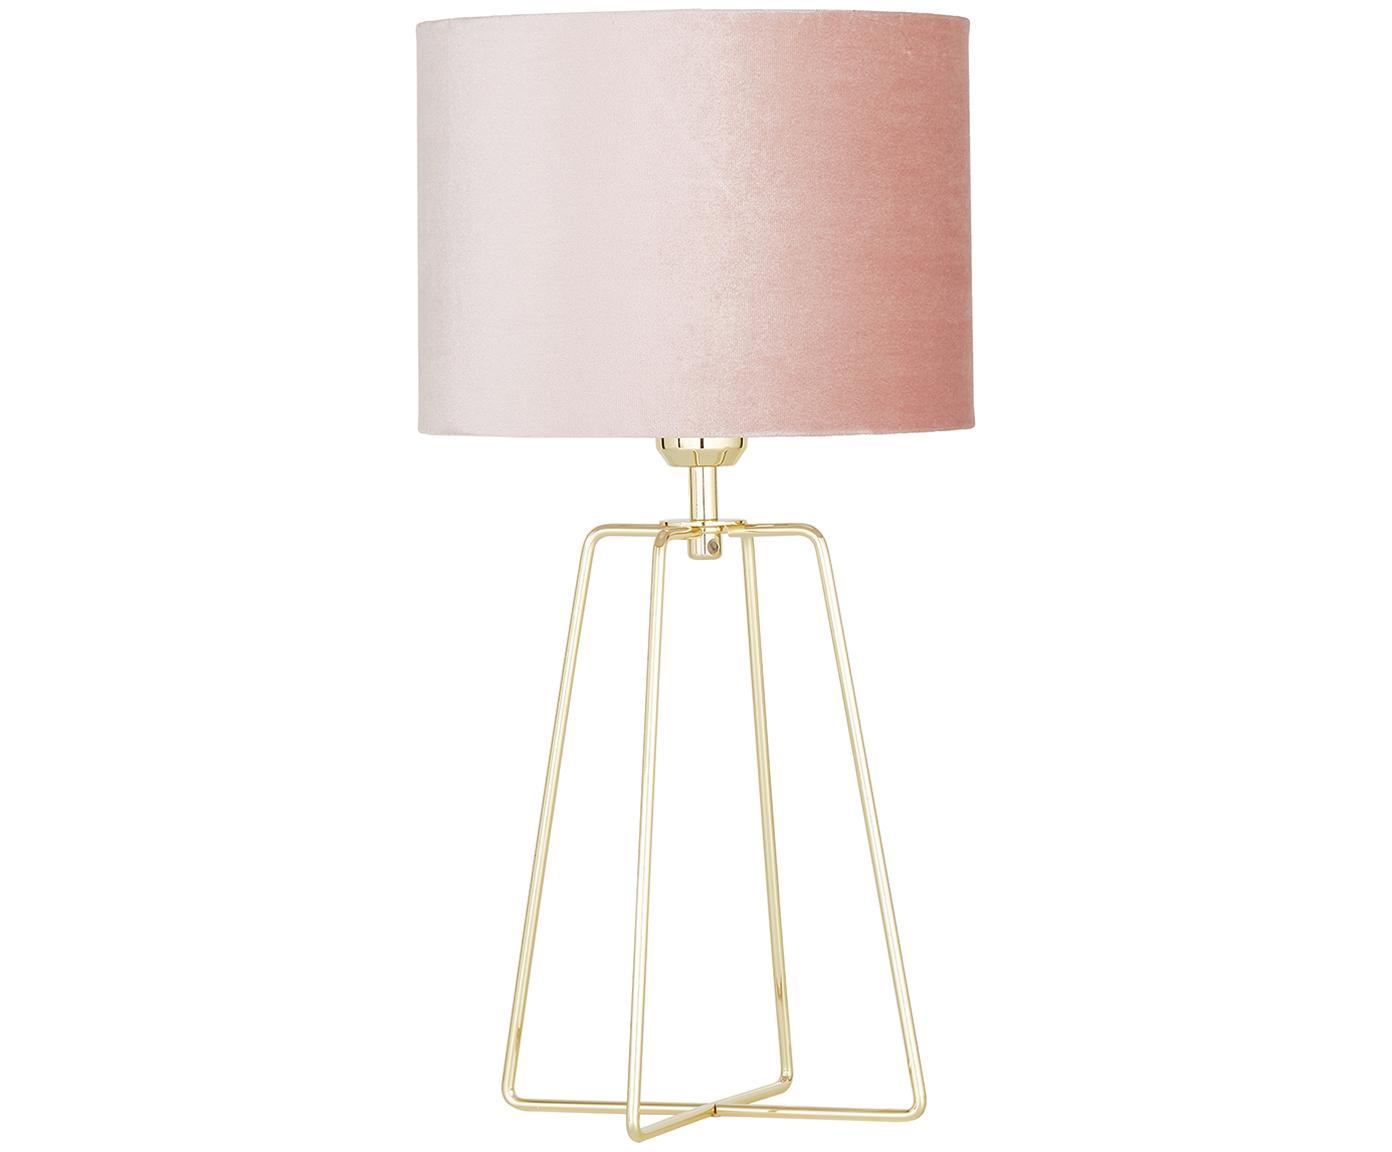 Tafellamp Miranda, Lampenkap: fluweel, Lampvoet: vermessingd metaal, Lampenkap: oudroze. Lampvoet: glanzend messingkleurig. Snoer: transparant, Ø 25 x H 49 cm